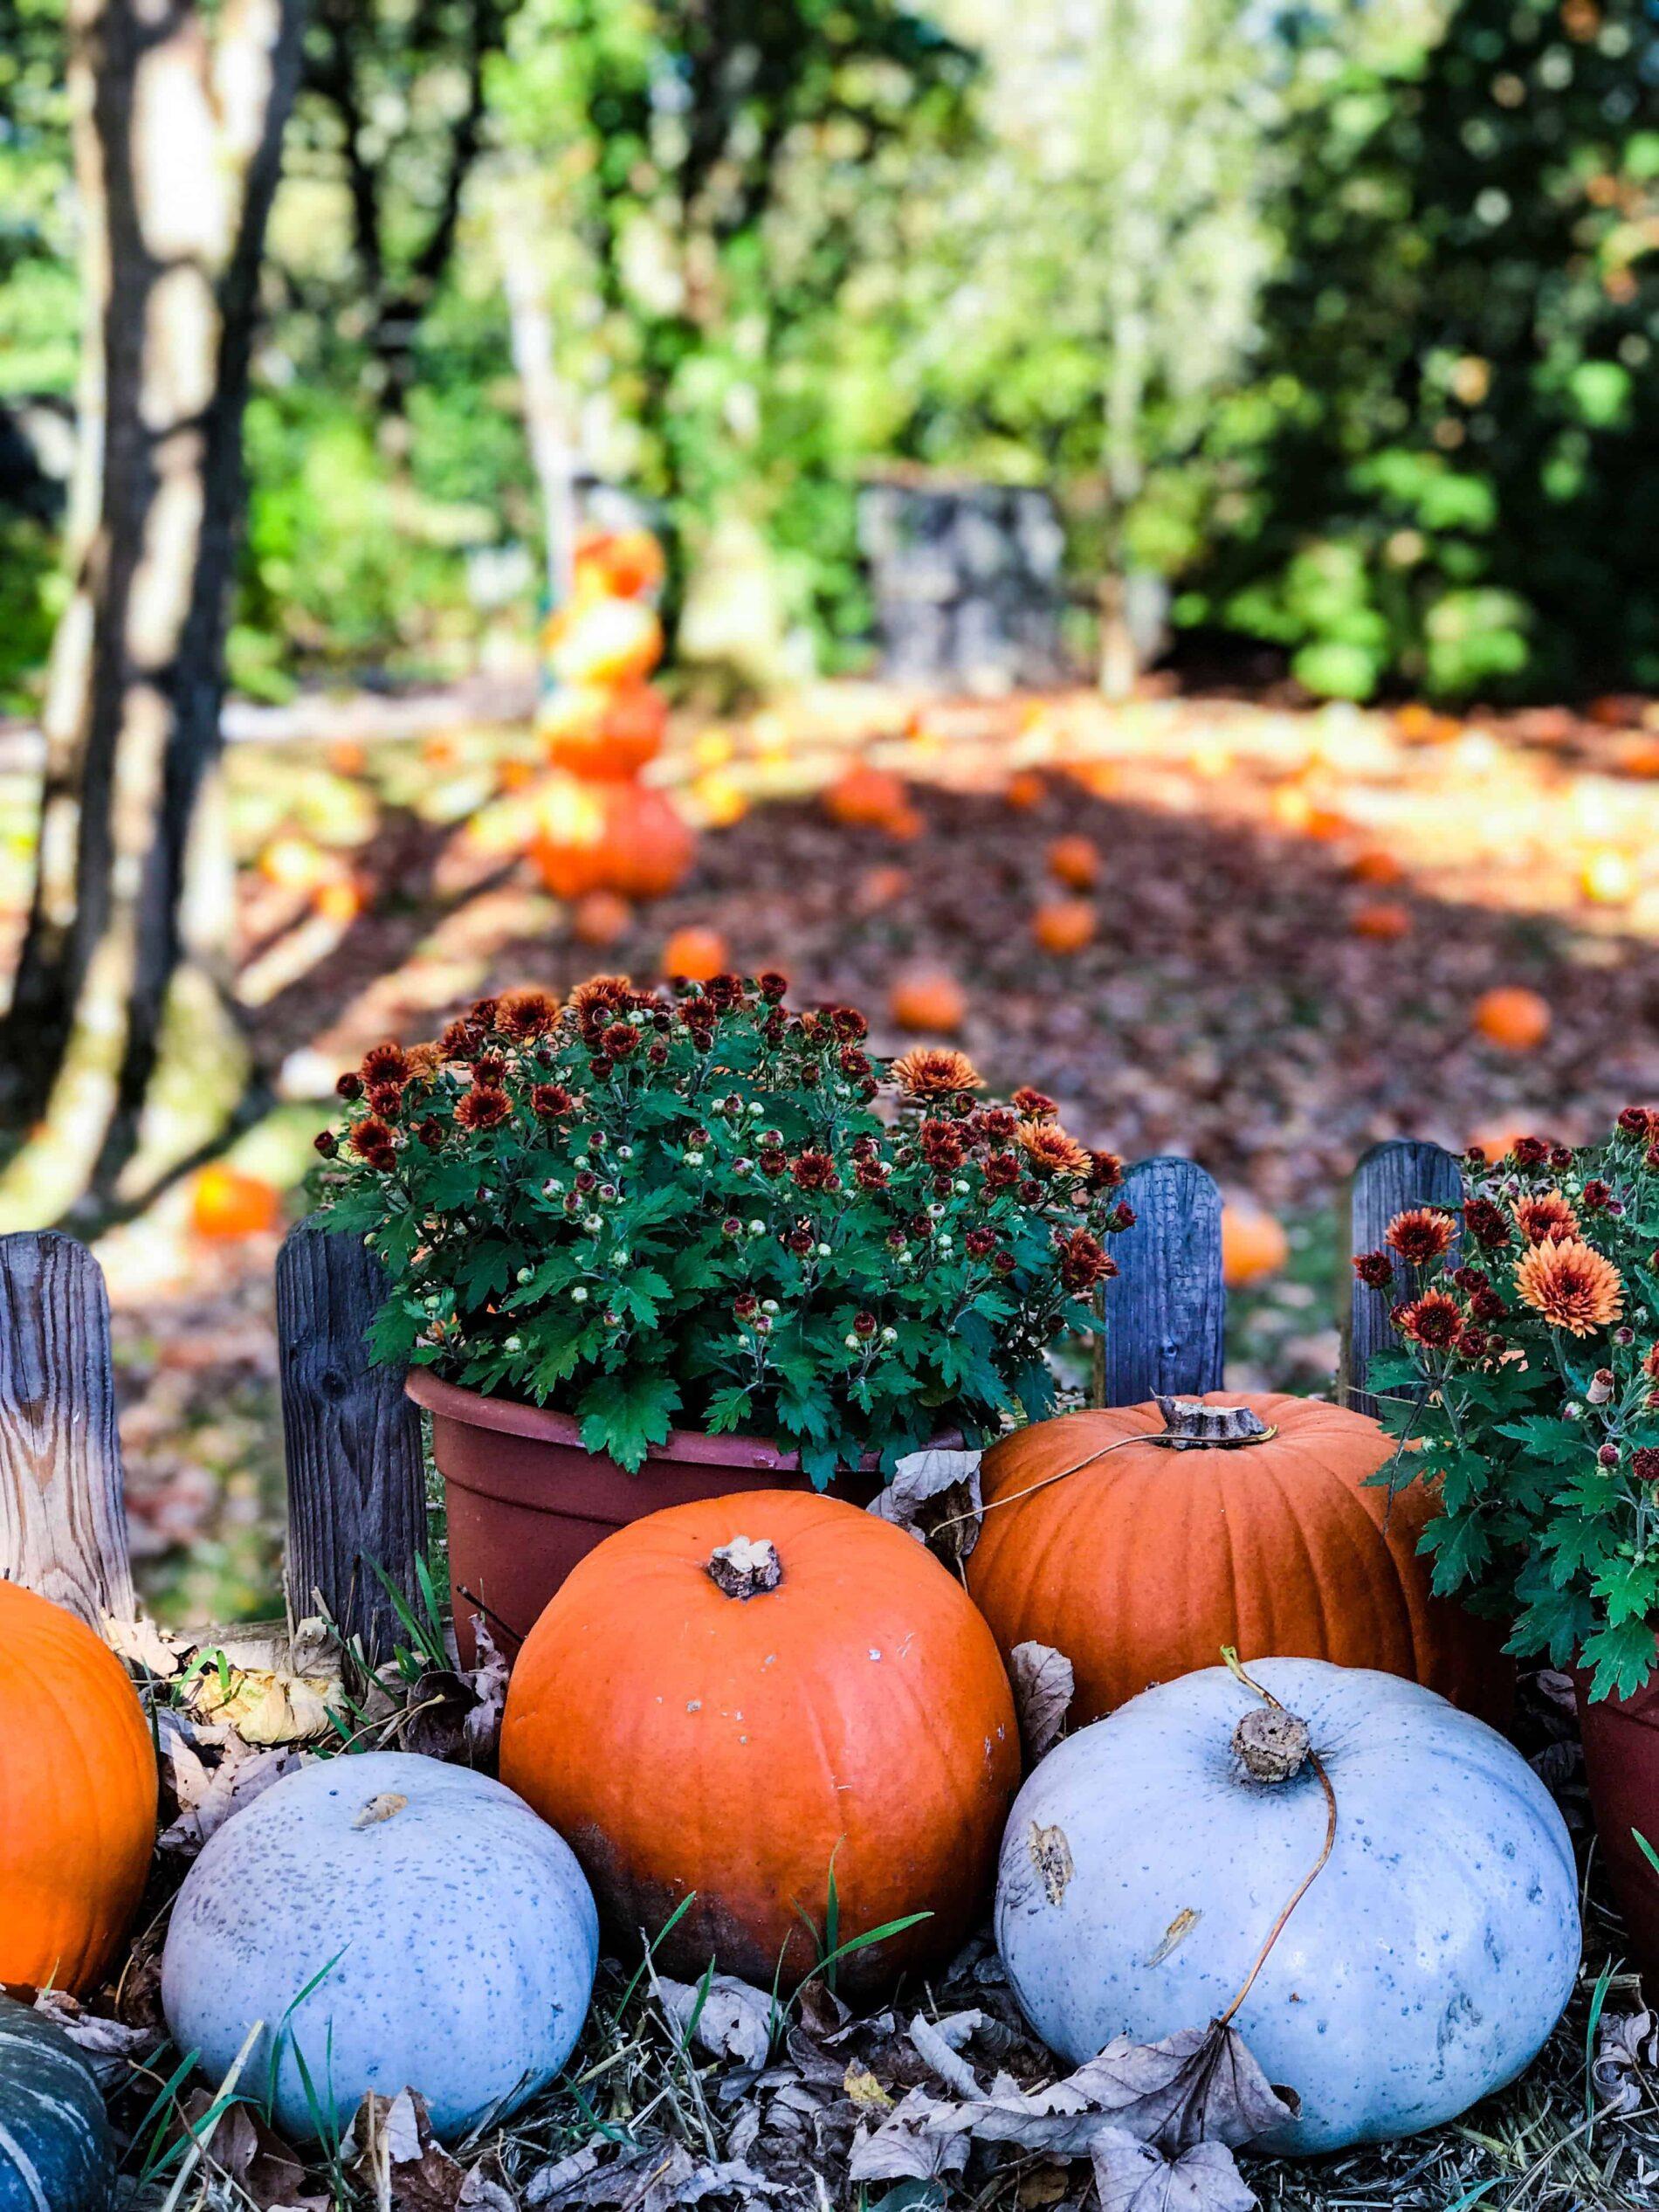 Pumpkin picking patches